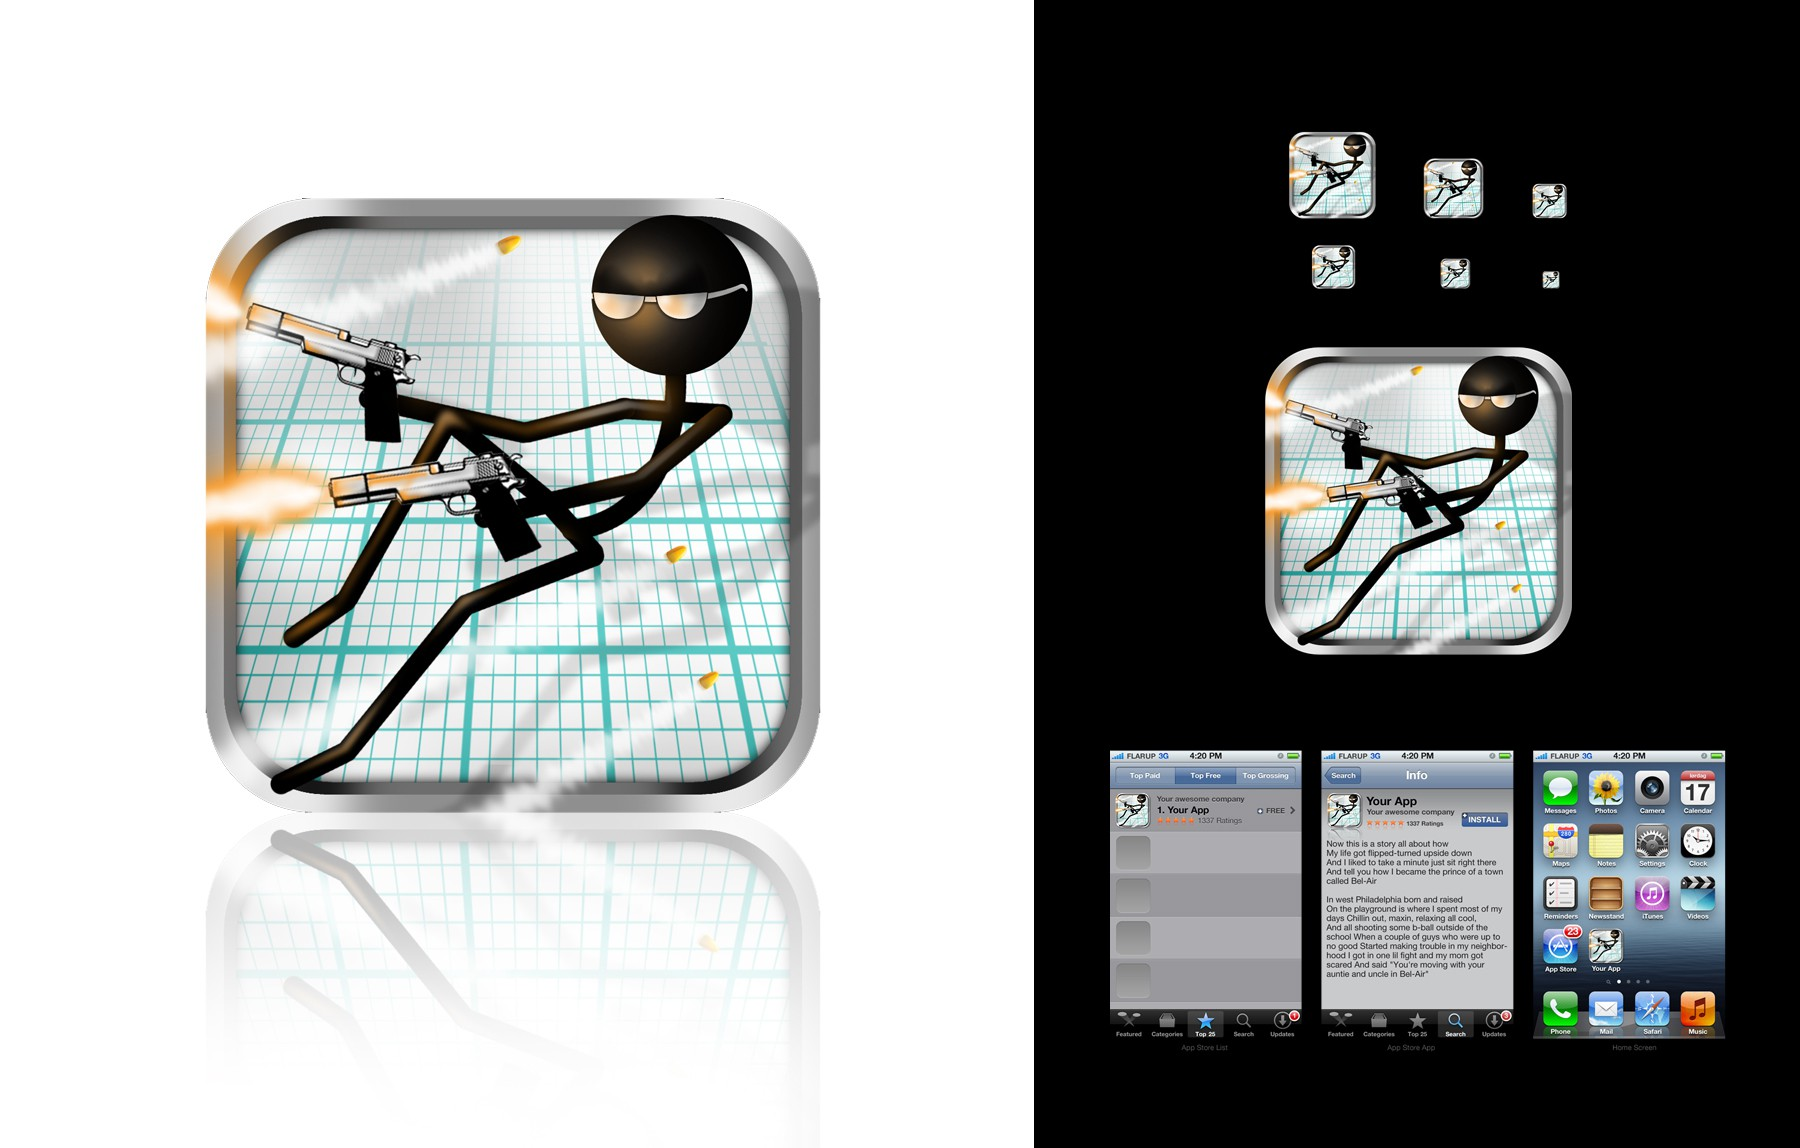 iOS game Gun Fu: Stickman Edition needs a new icon!